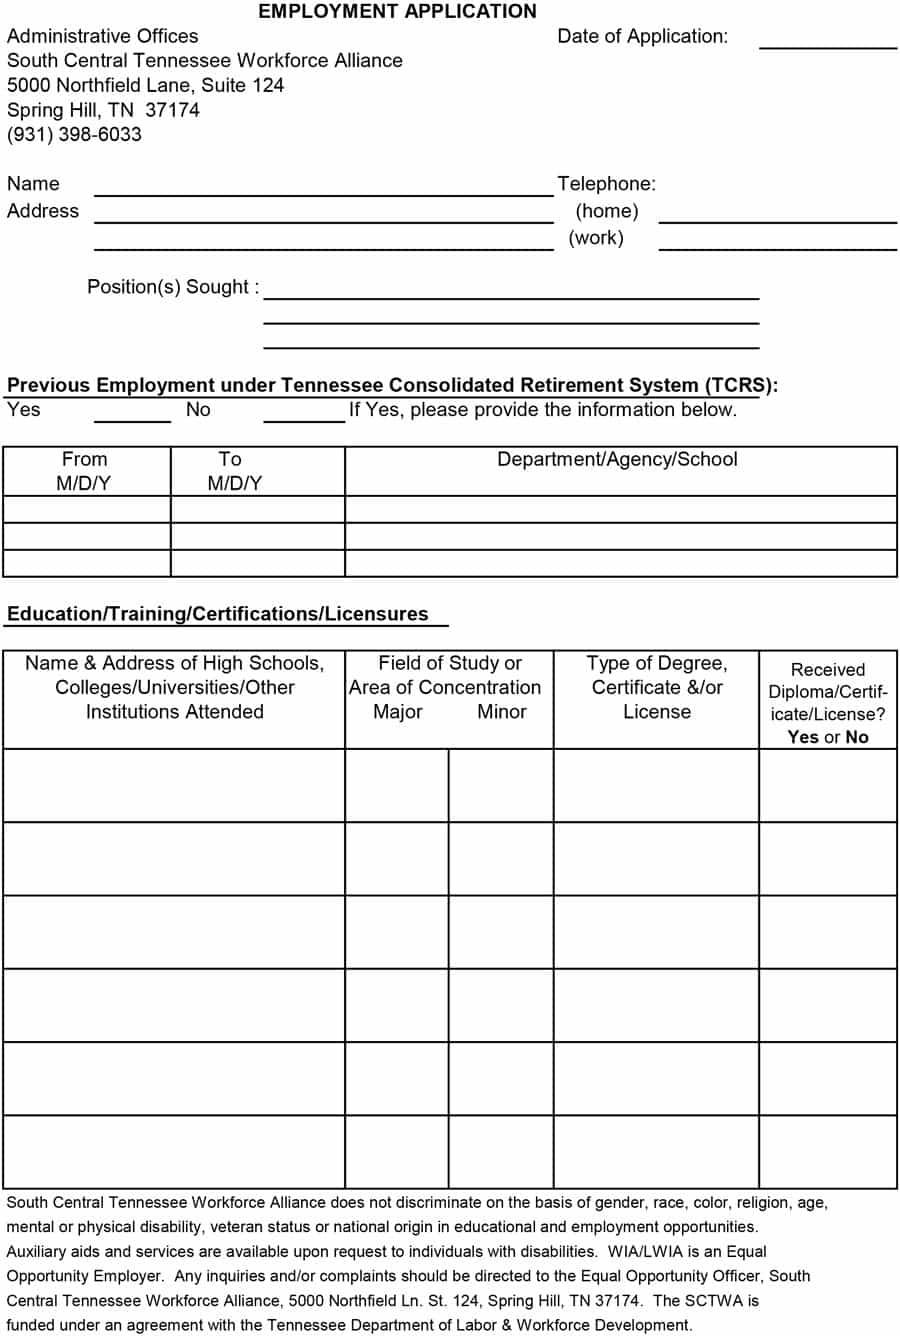 50 Free Employment / Job Application Form Templates [Printable - Free Printable Employment Application